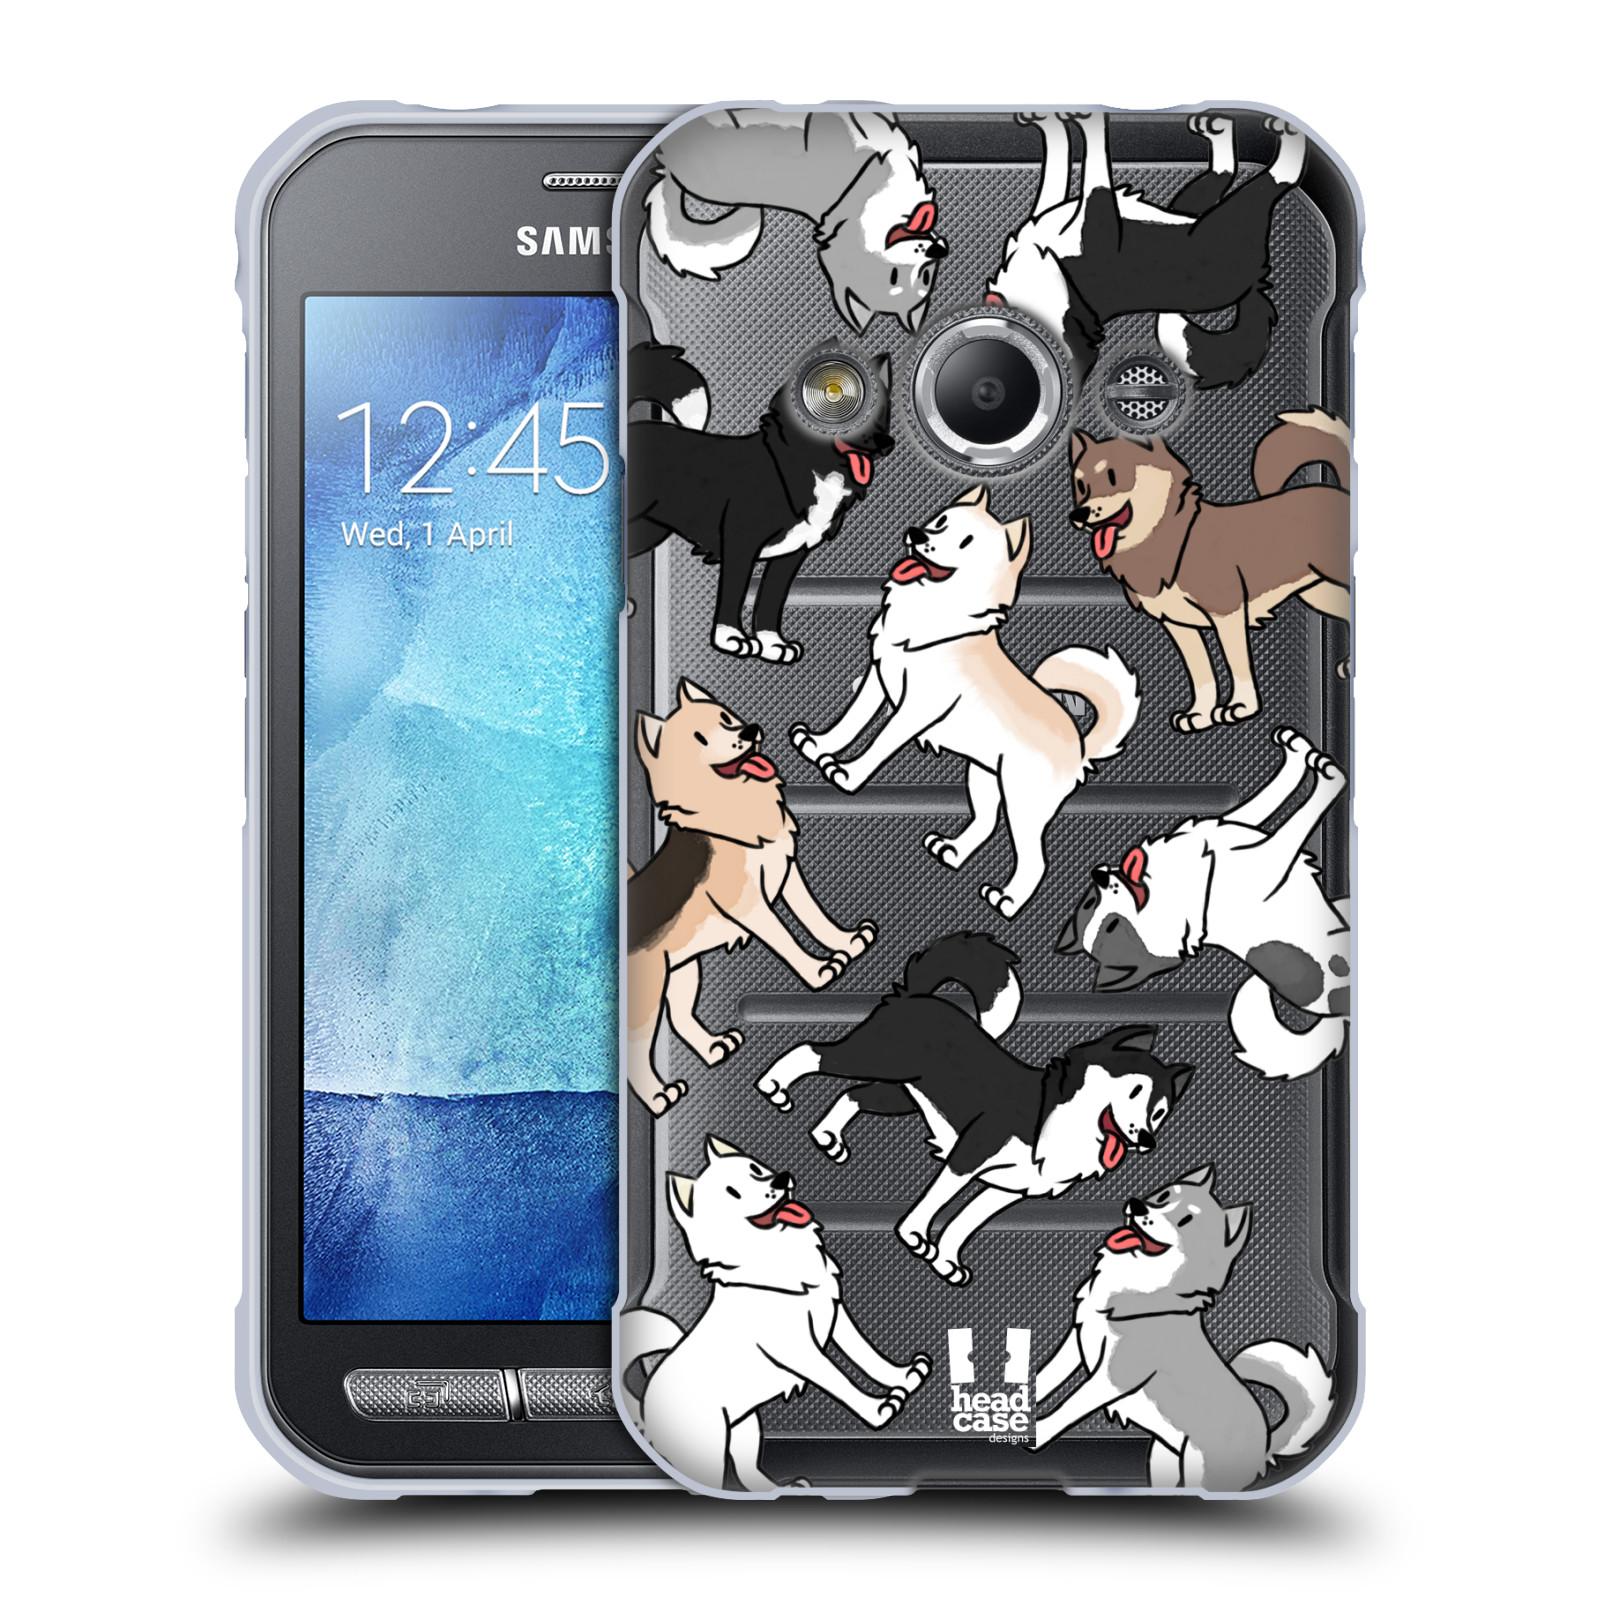 HEAD CASE silikonový obal na mobil Samsung Galaxy Xcover 3 pejsek Sibiřský husky